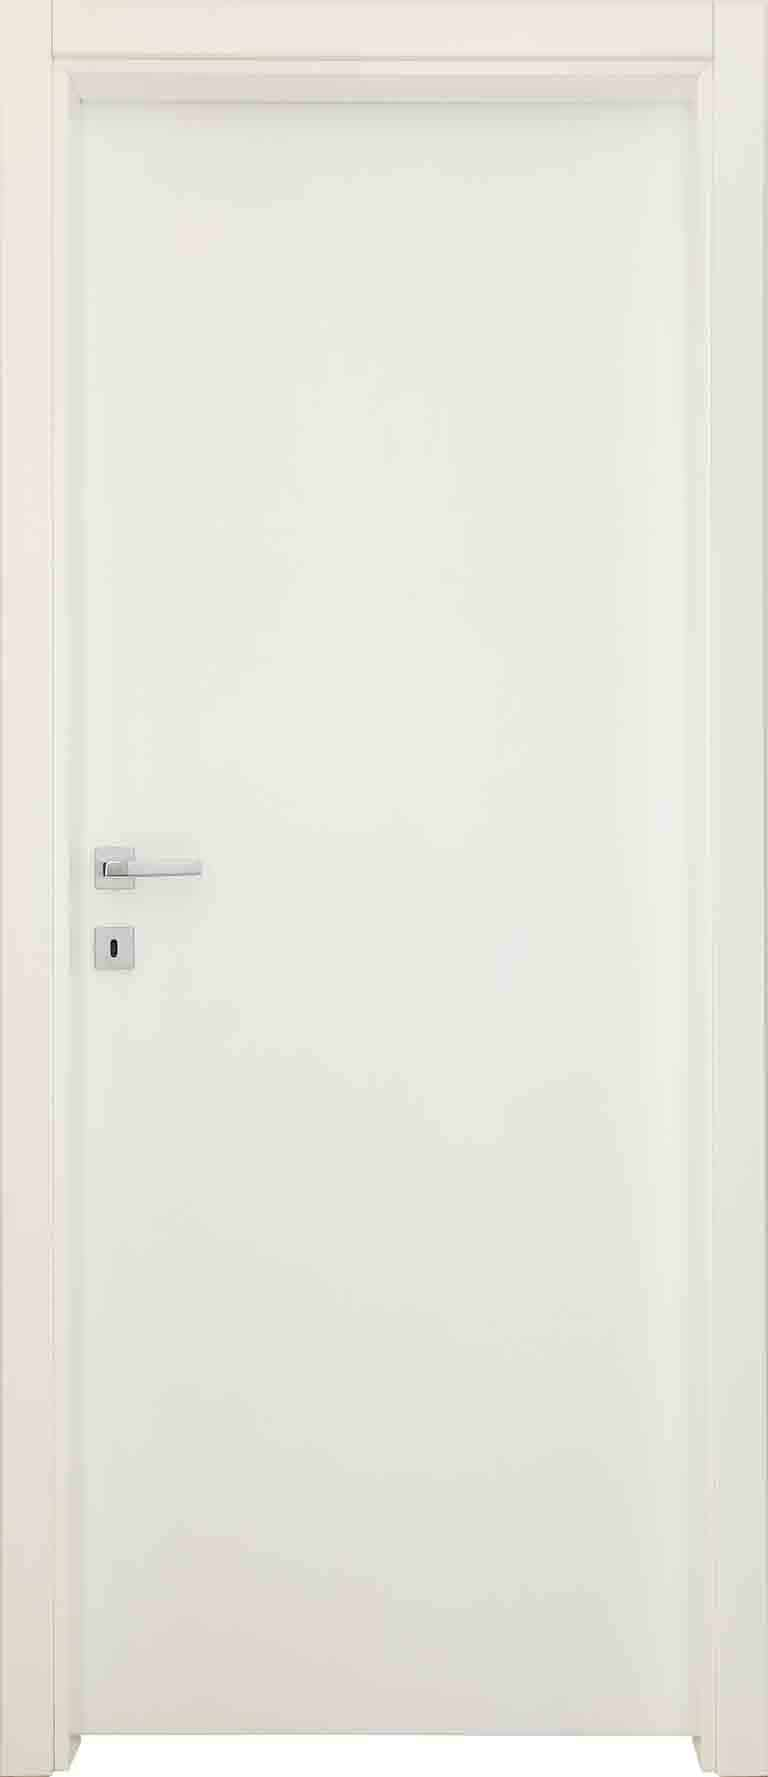 protuprovalna vrata forlux bijela lakirana